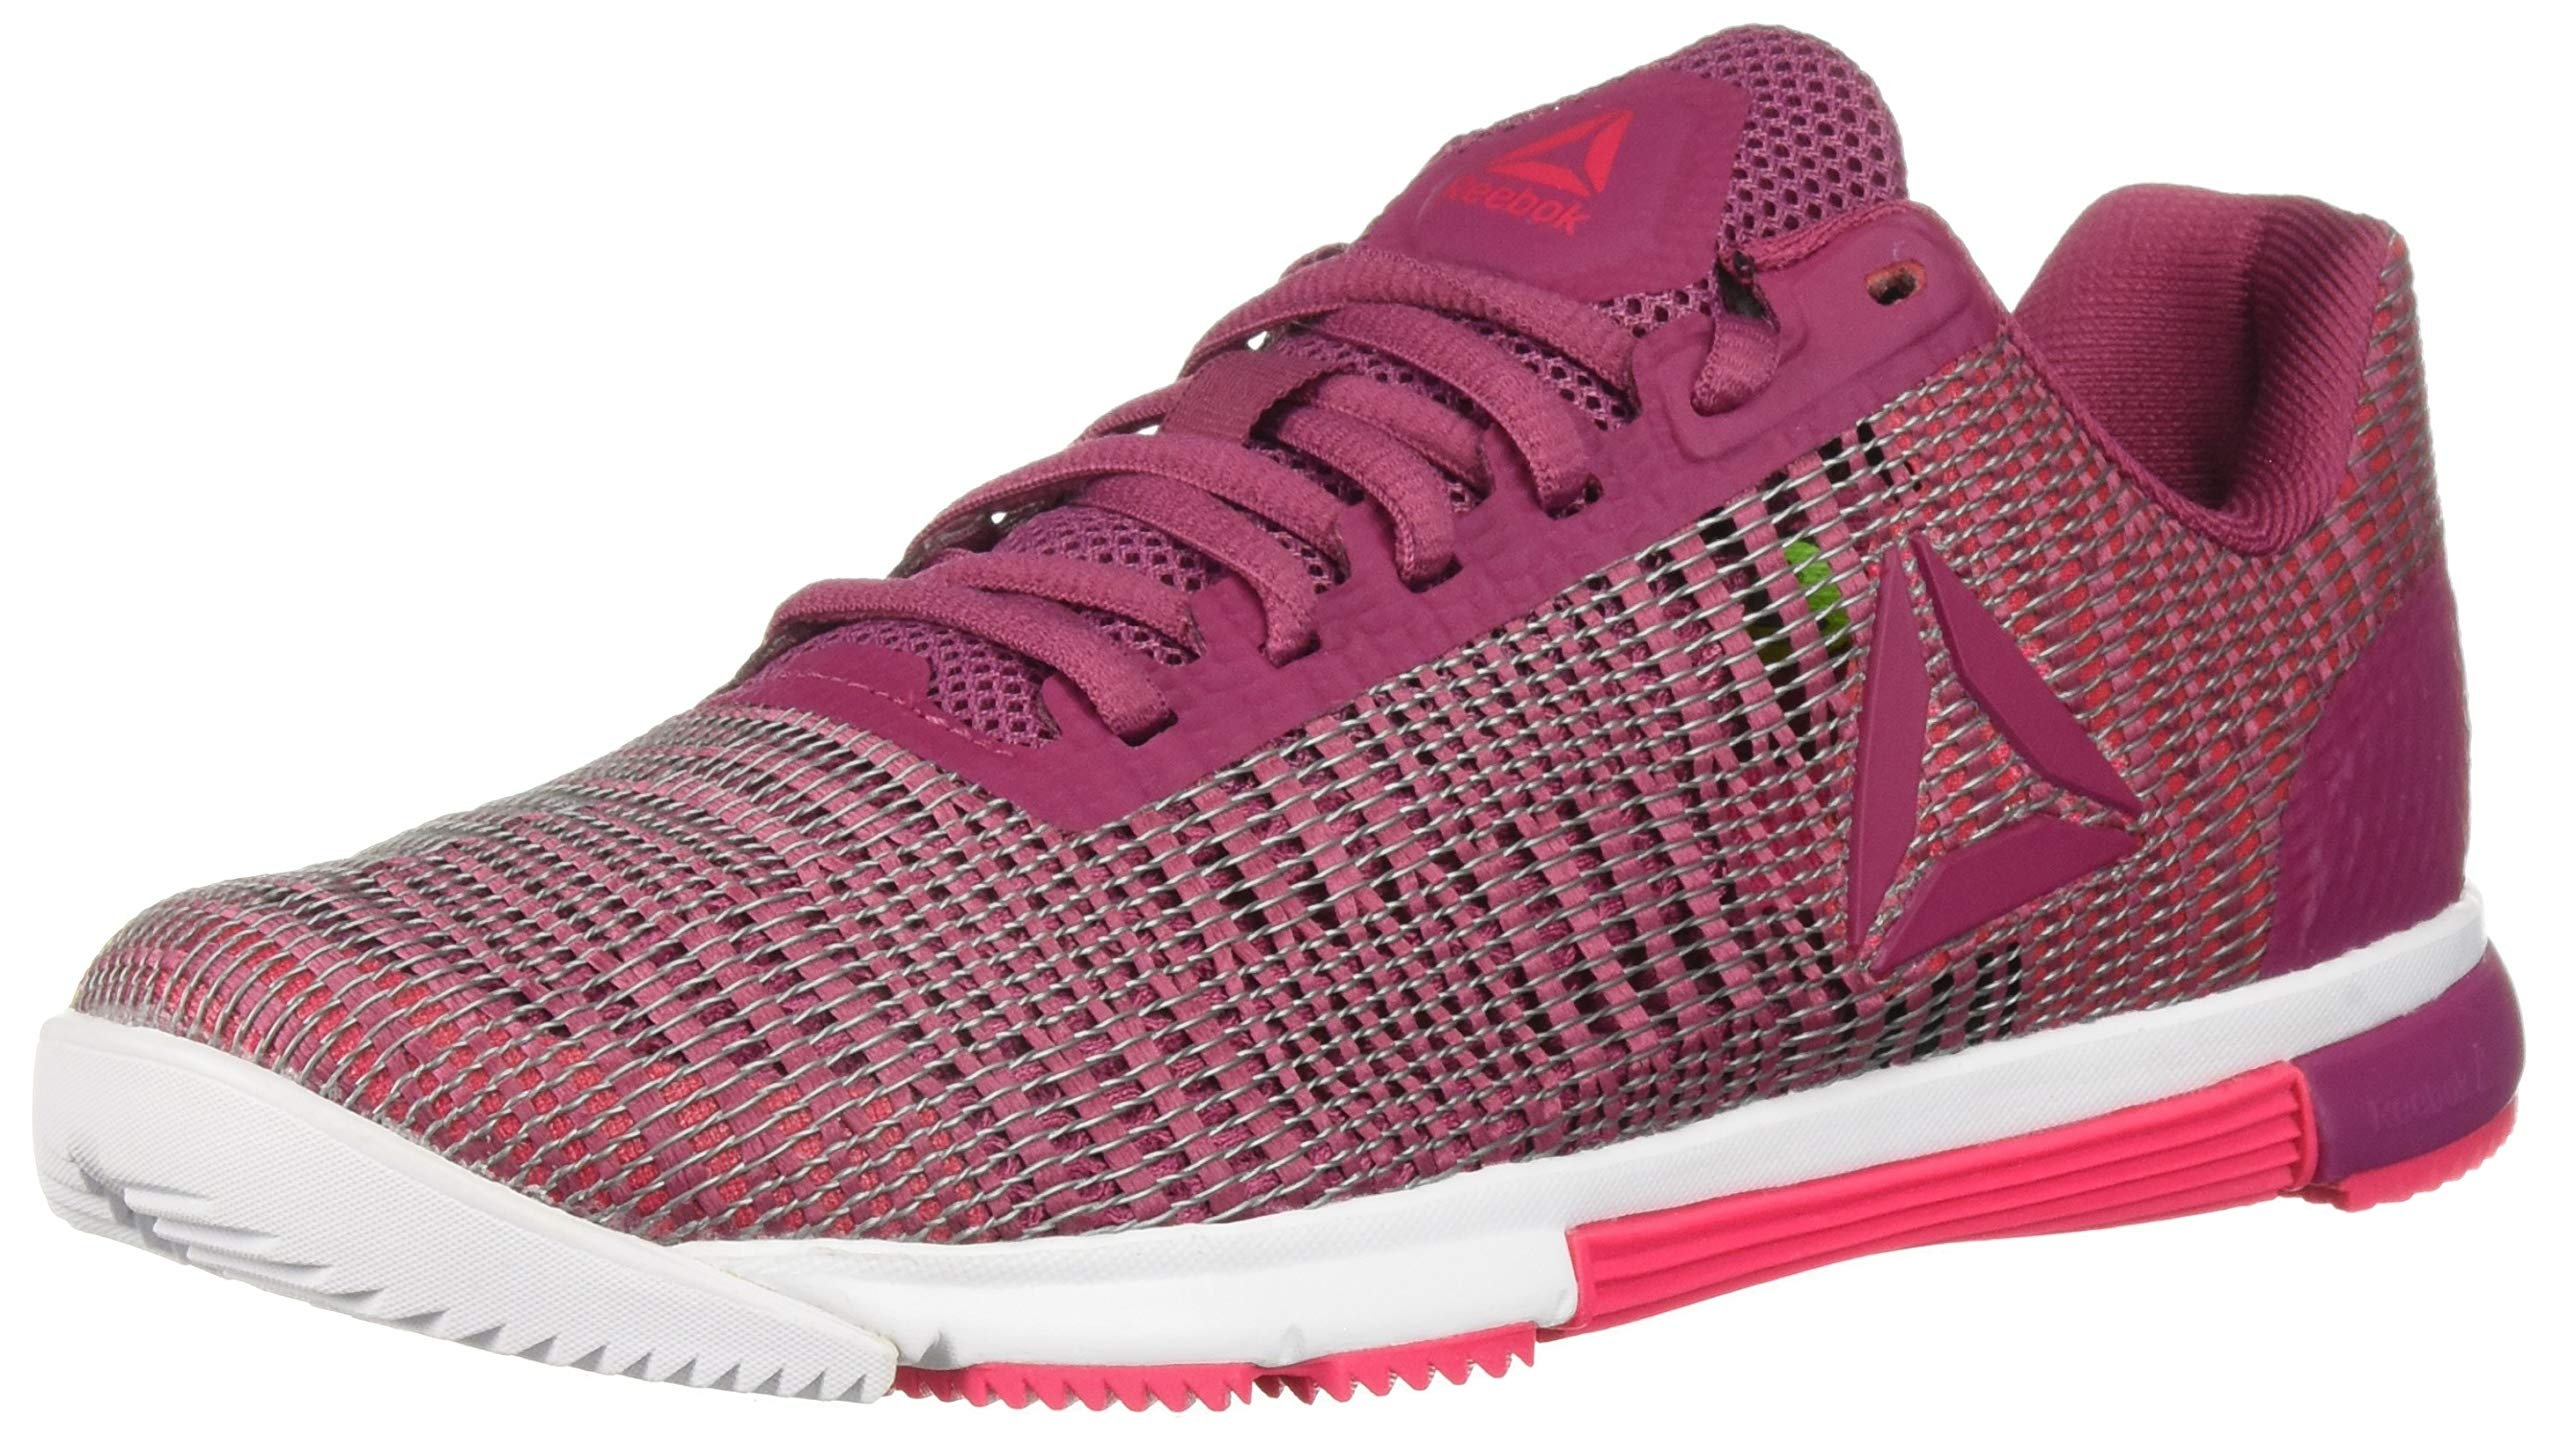 Reebok Women's Speed Tr Flexweave Cross Trainer, Berry/Twisted Pink, 5 M US